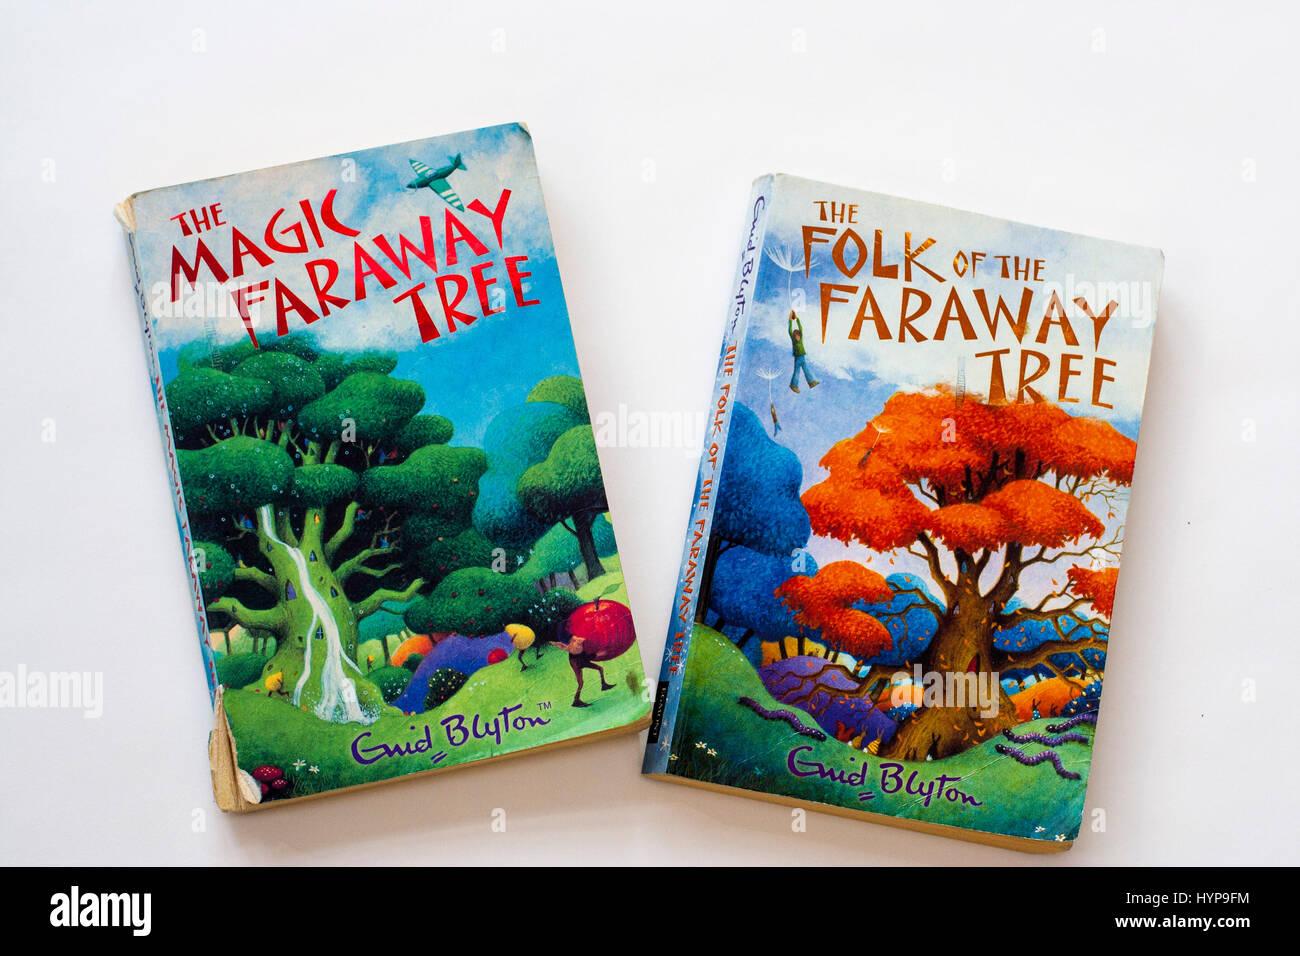 Enid Blyton - Magic Faraway Tree Book - Stock Image